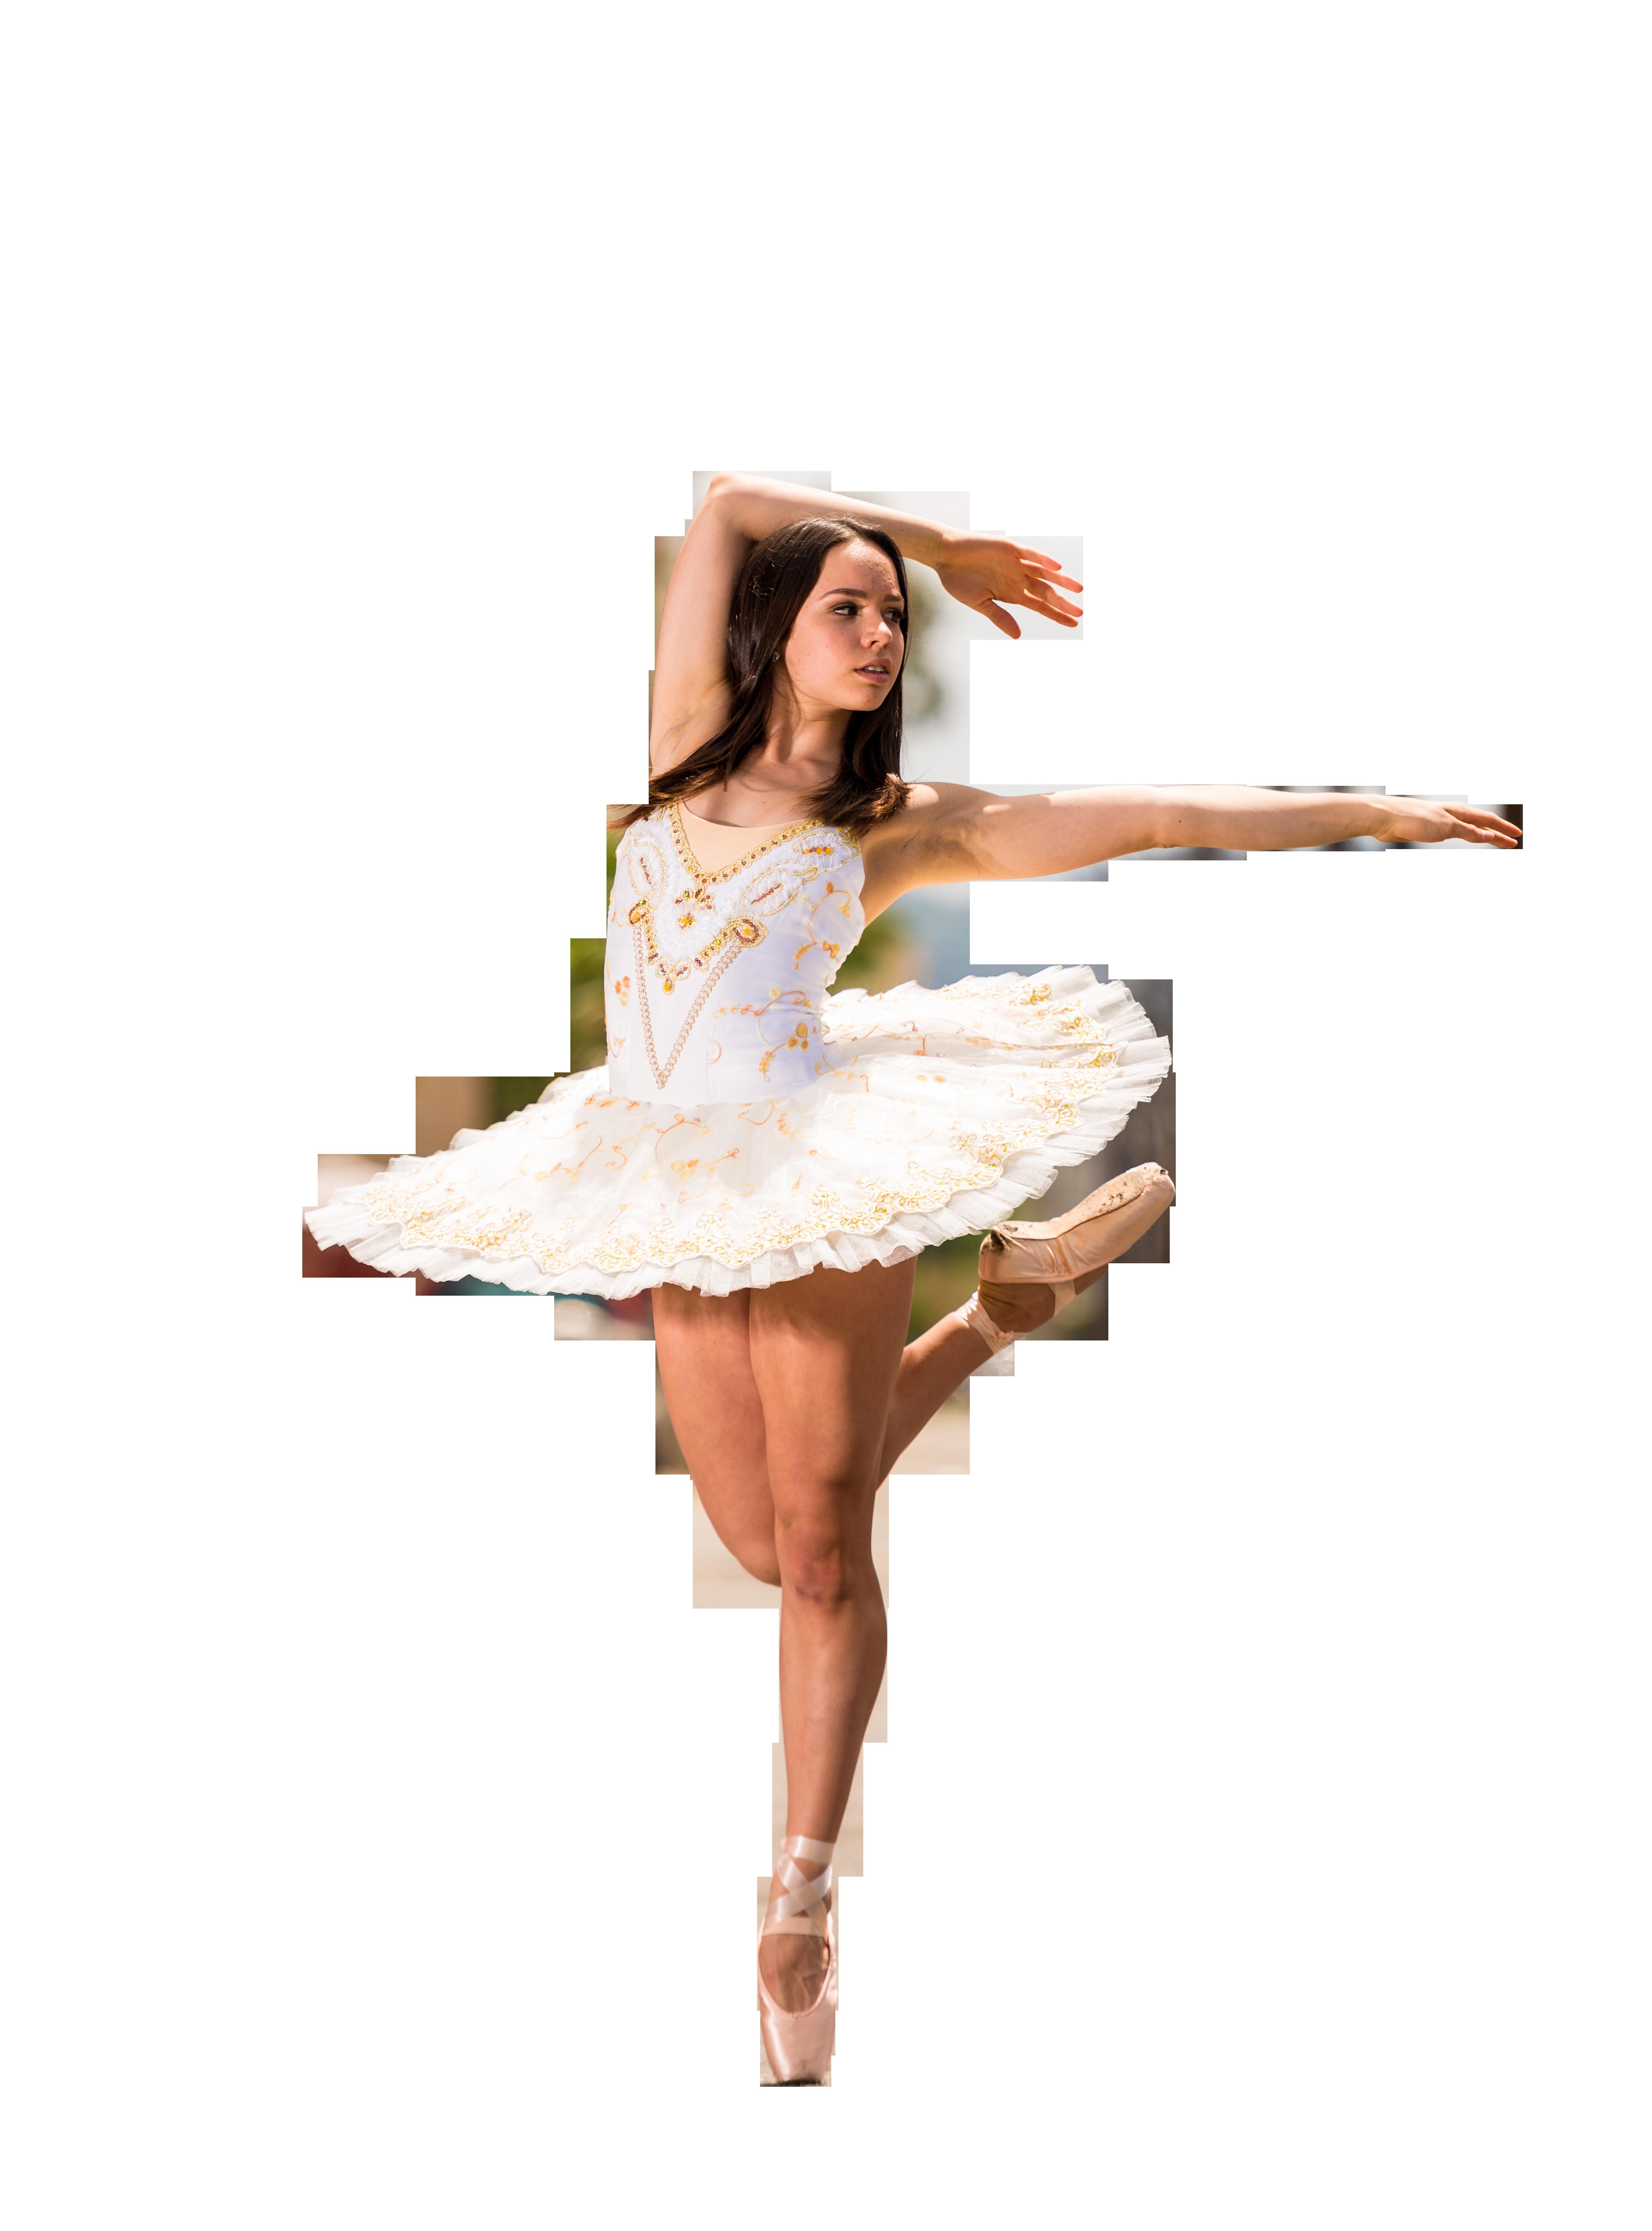 Girl In White Short Dress Doing Gymnastics Transparent Background PNG